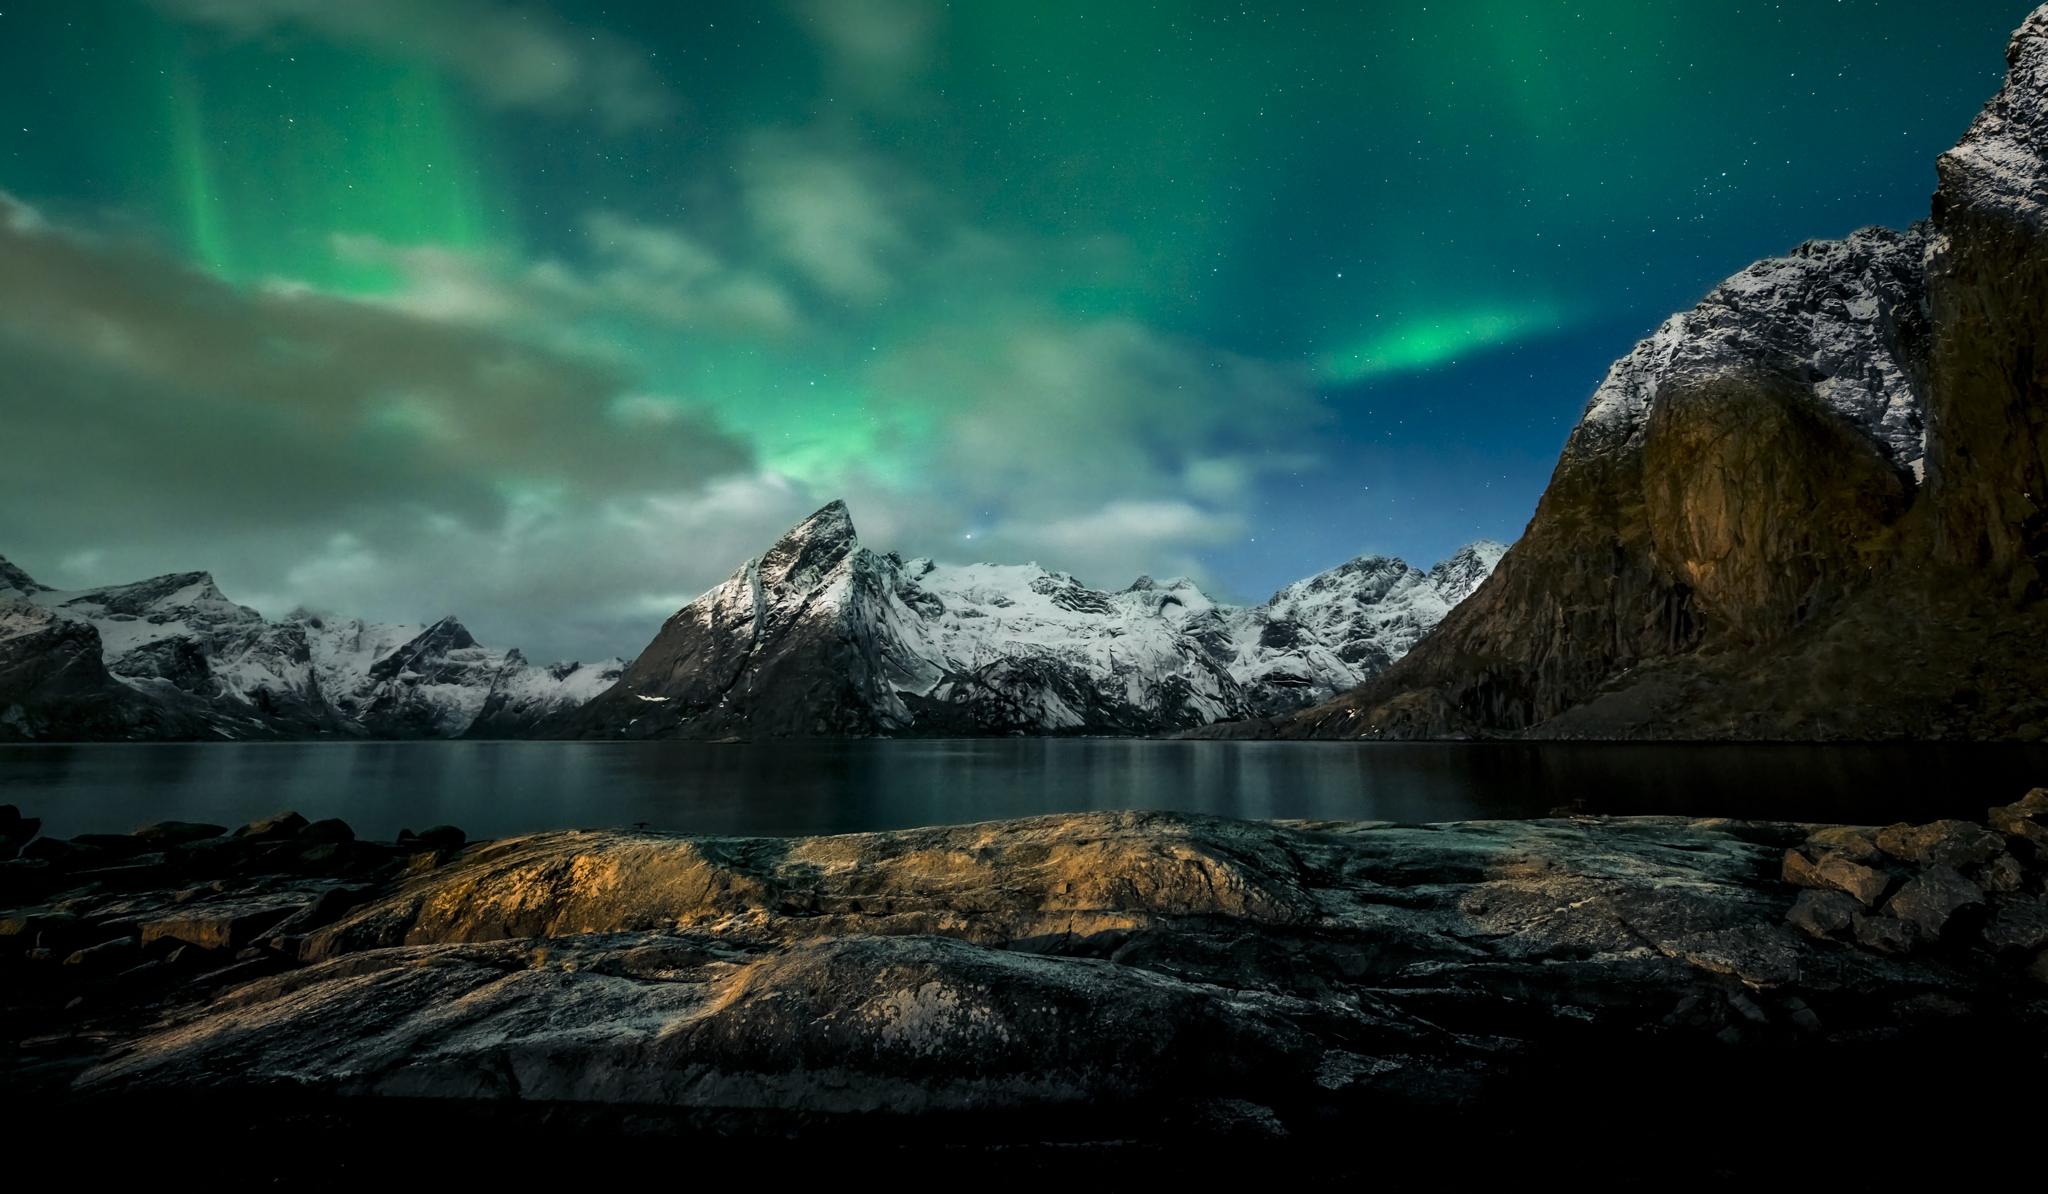 Aurora Borealis And Mountain Hd Wallpapers Wallpaper Cave